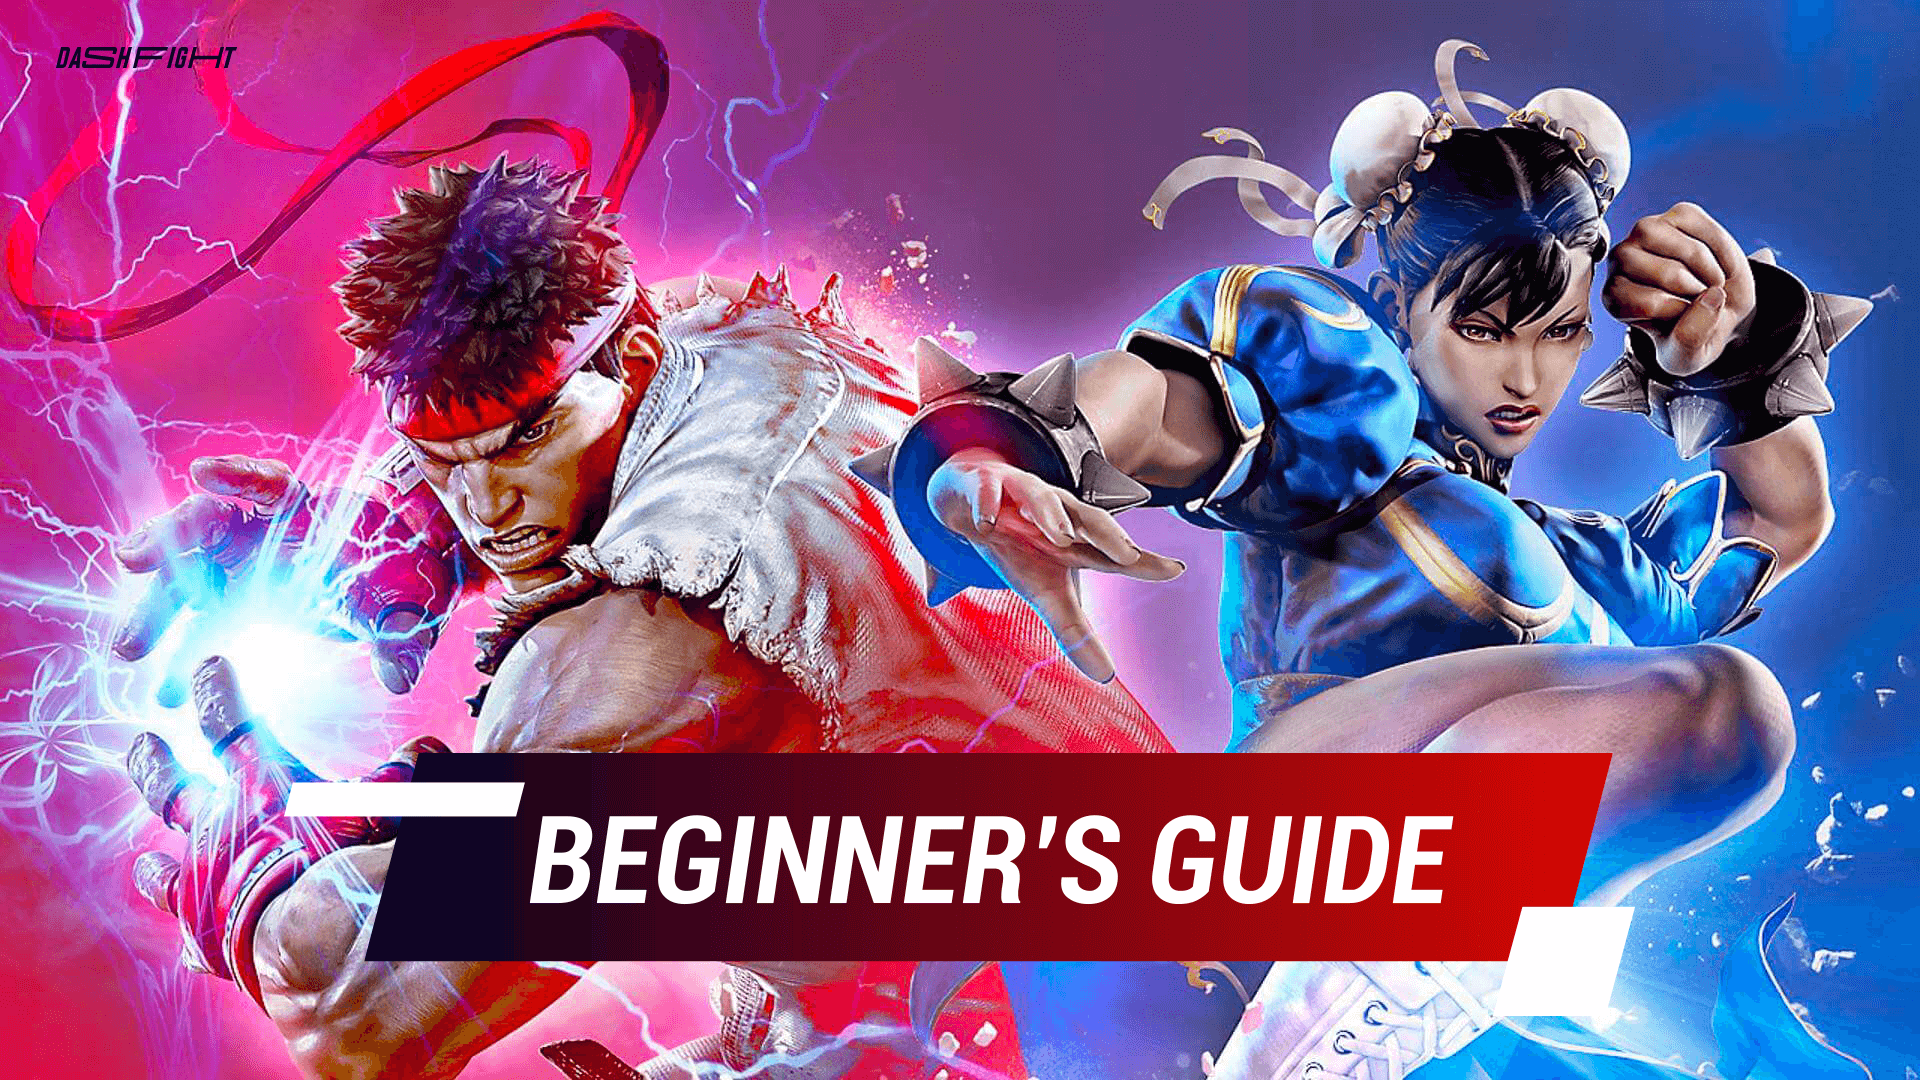 Street Fighter V - an Ultimate Guide for Beginners